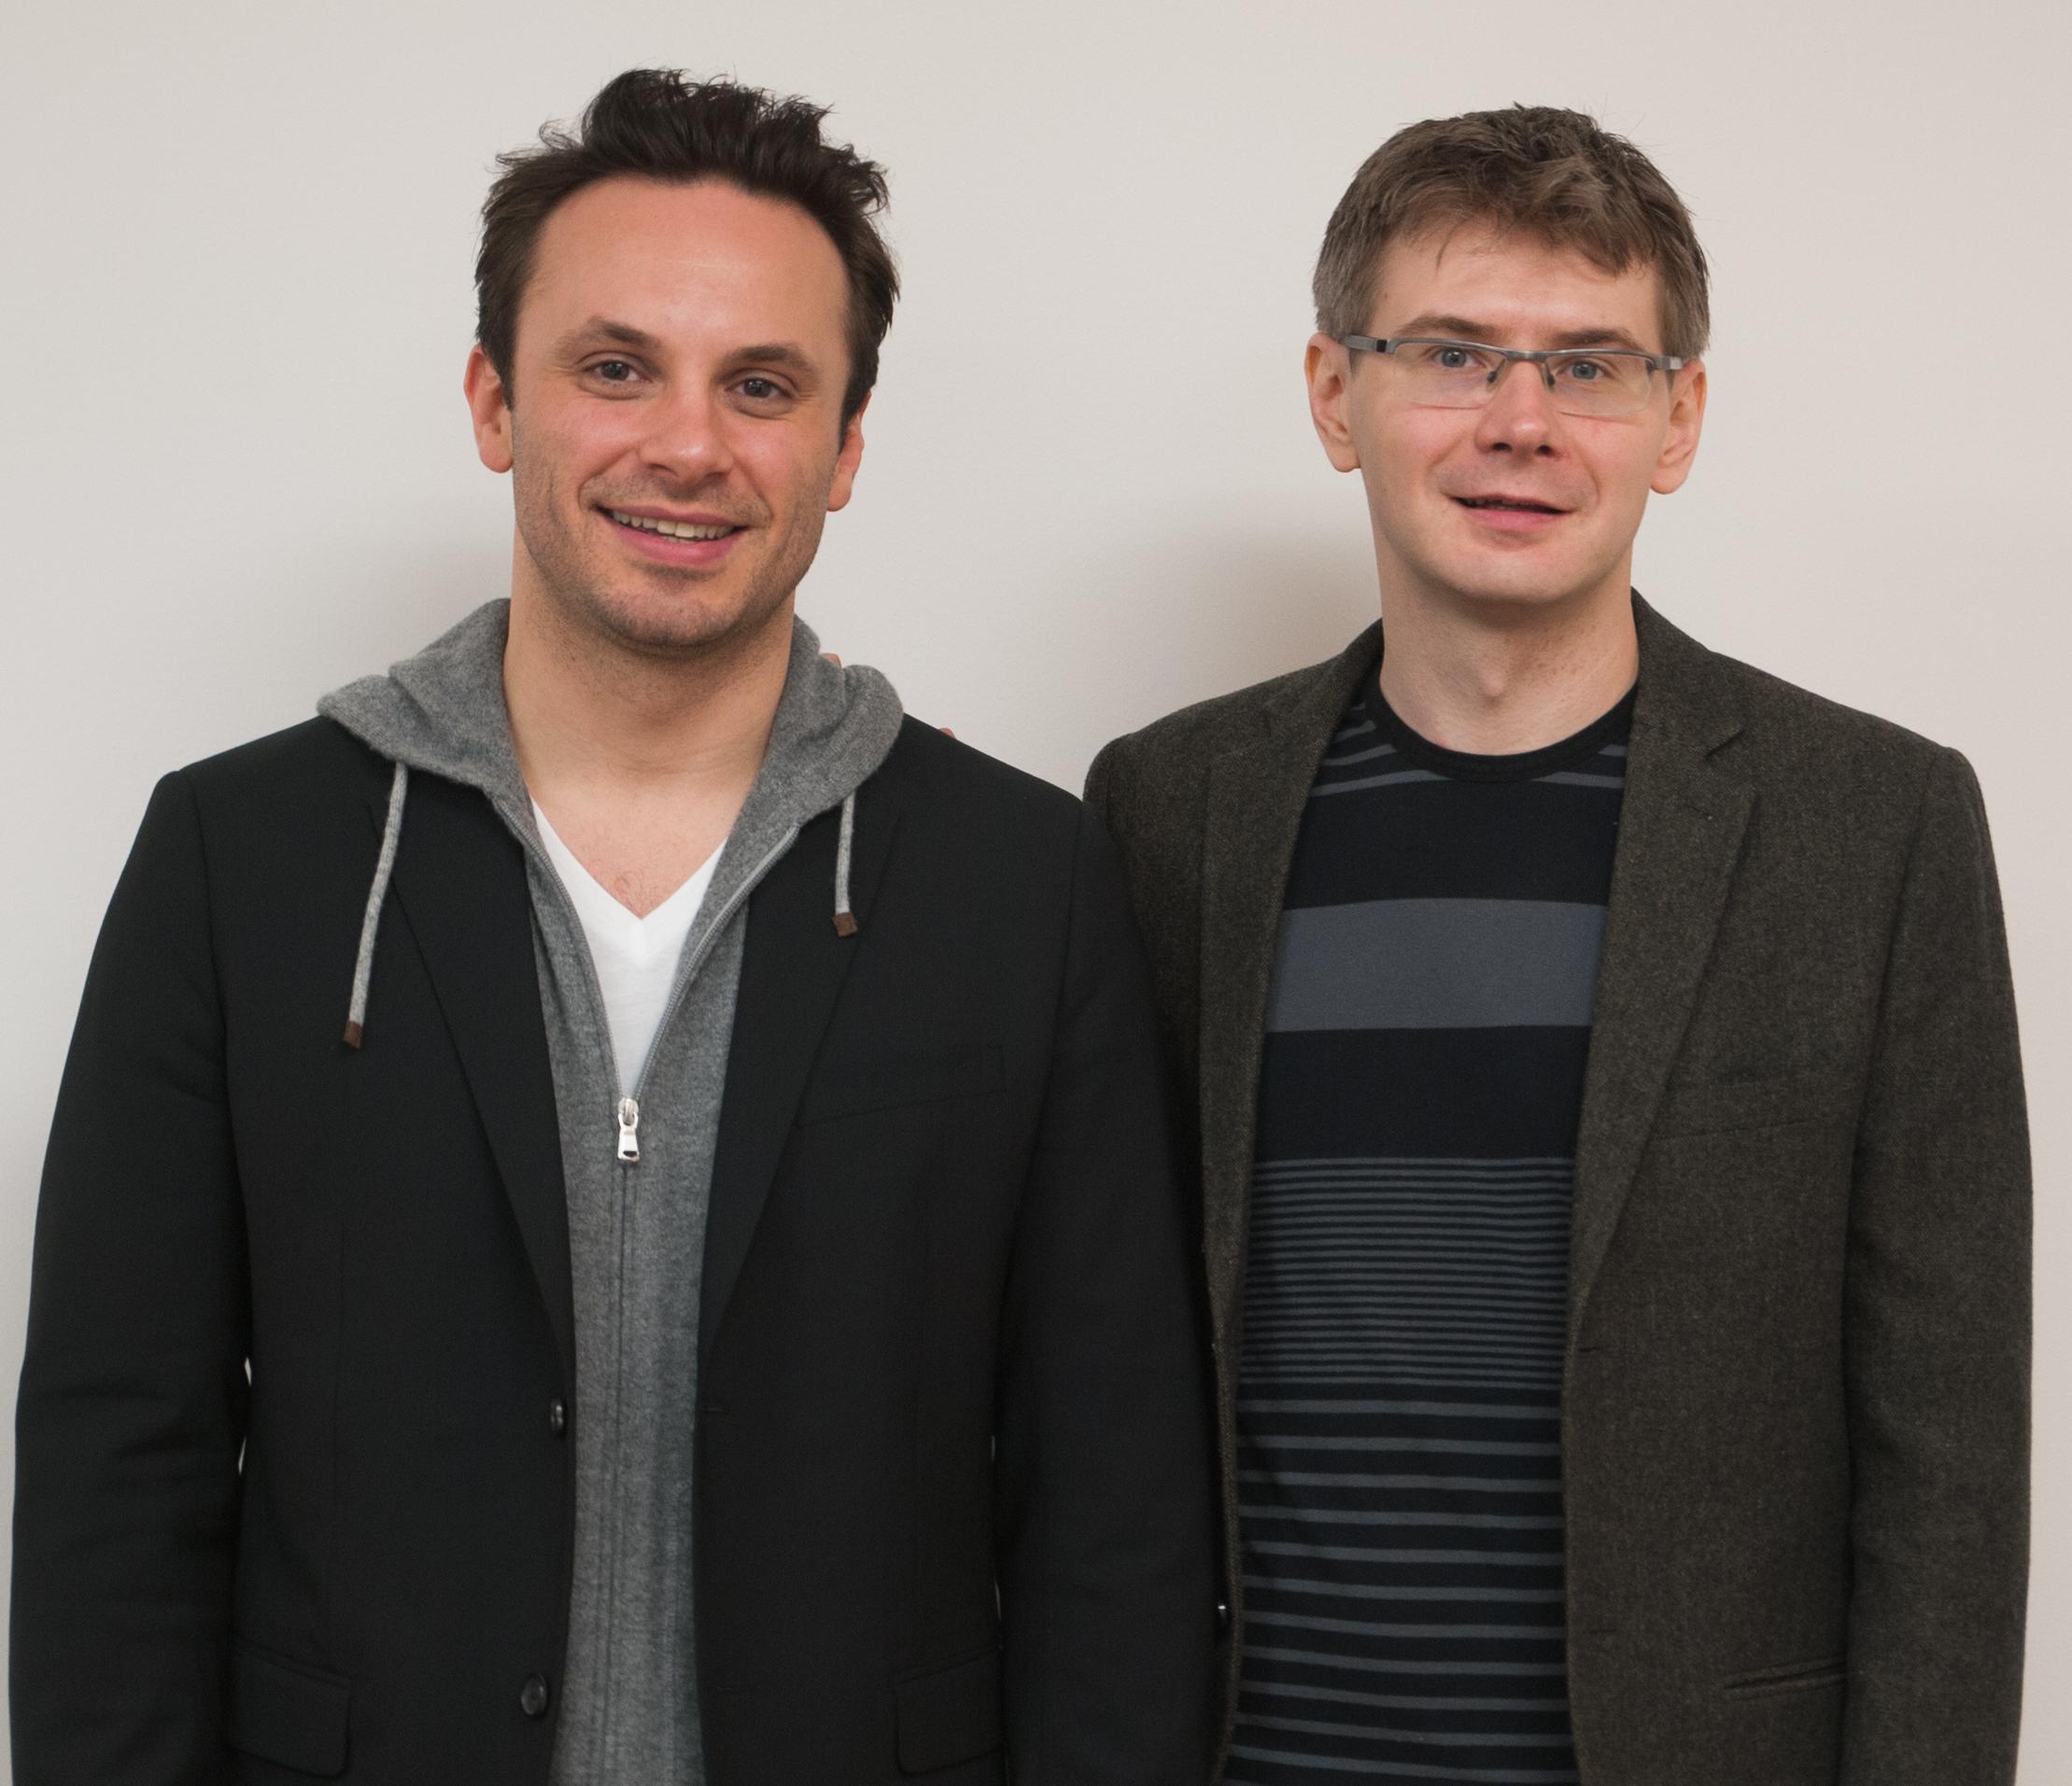 Descriptive Image for Computer Science Department Alumni Keynote Speakers at Bitcamp Hackathon